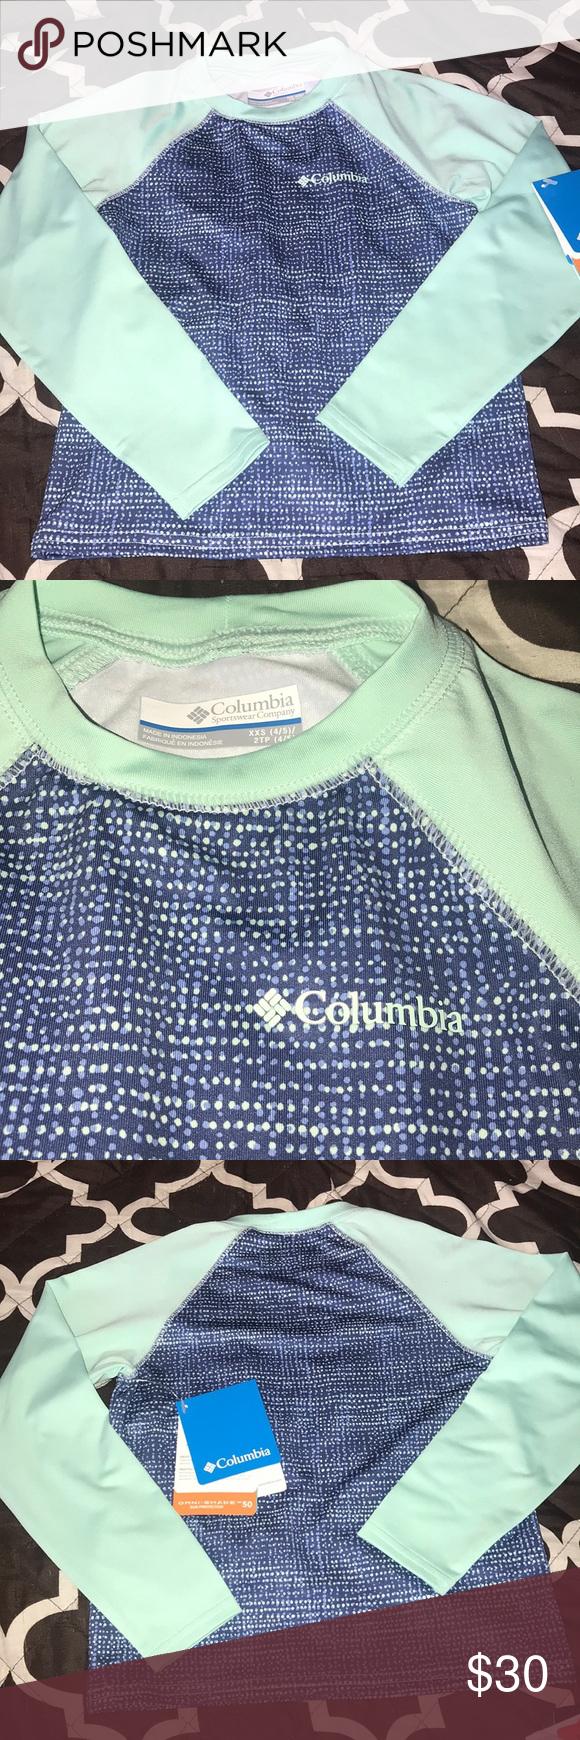 41a425b0 Girls Columbia sun guard long sleeve shirt XXS 4/5 New with tag. Omni